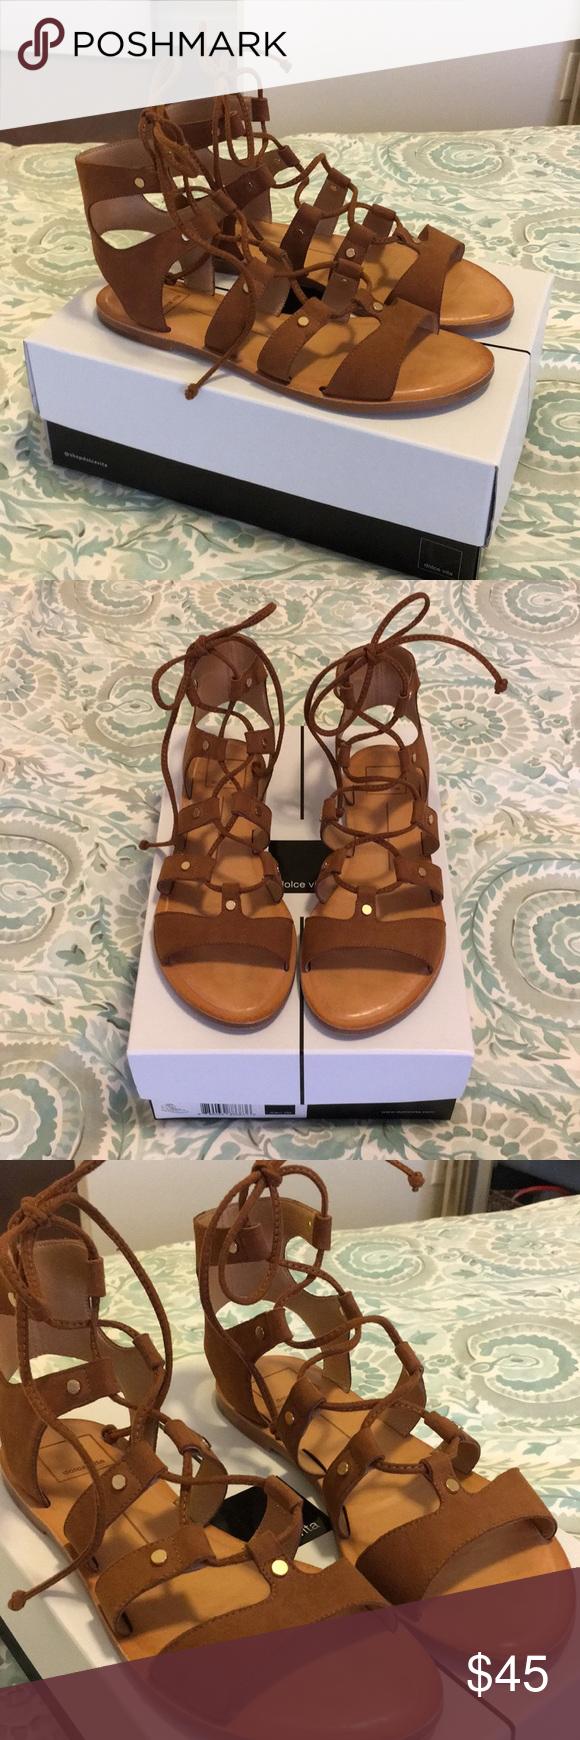 40c16ff0178 Dolce Vita Flat Gladiator Sandal